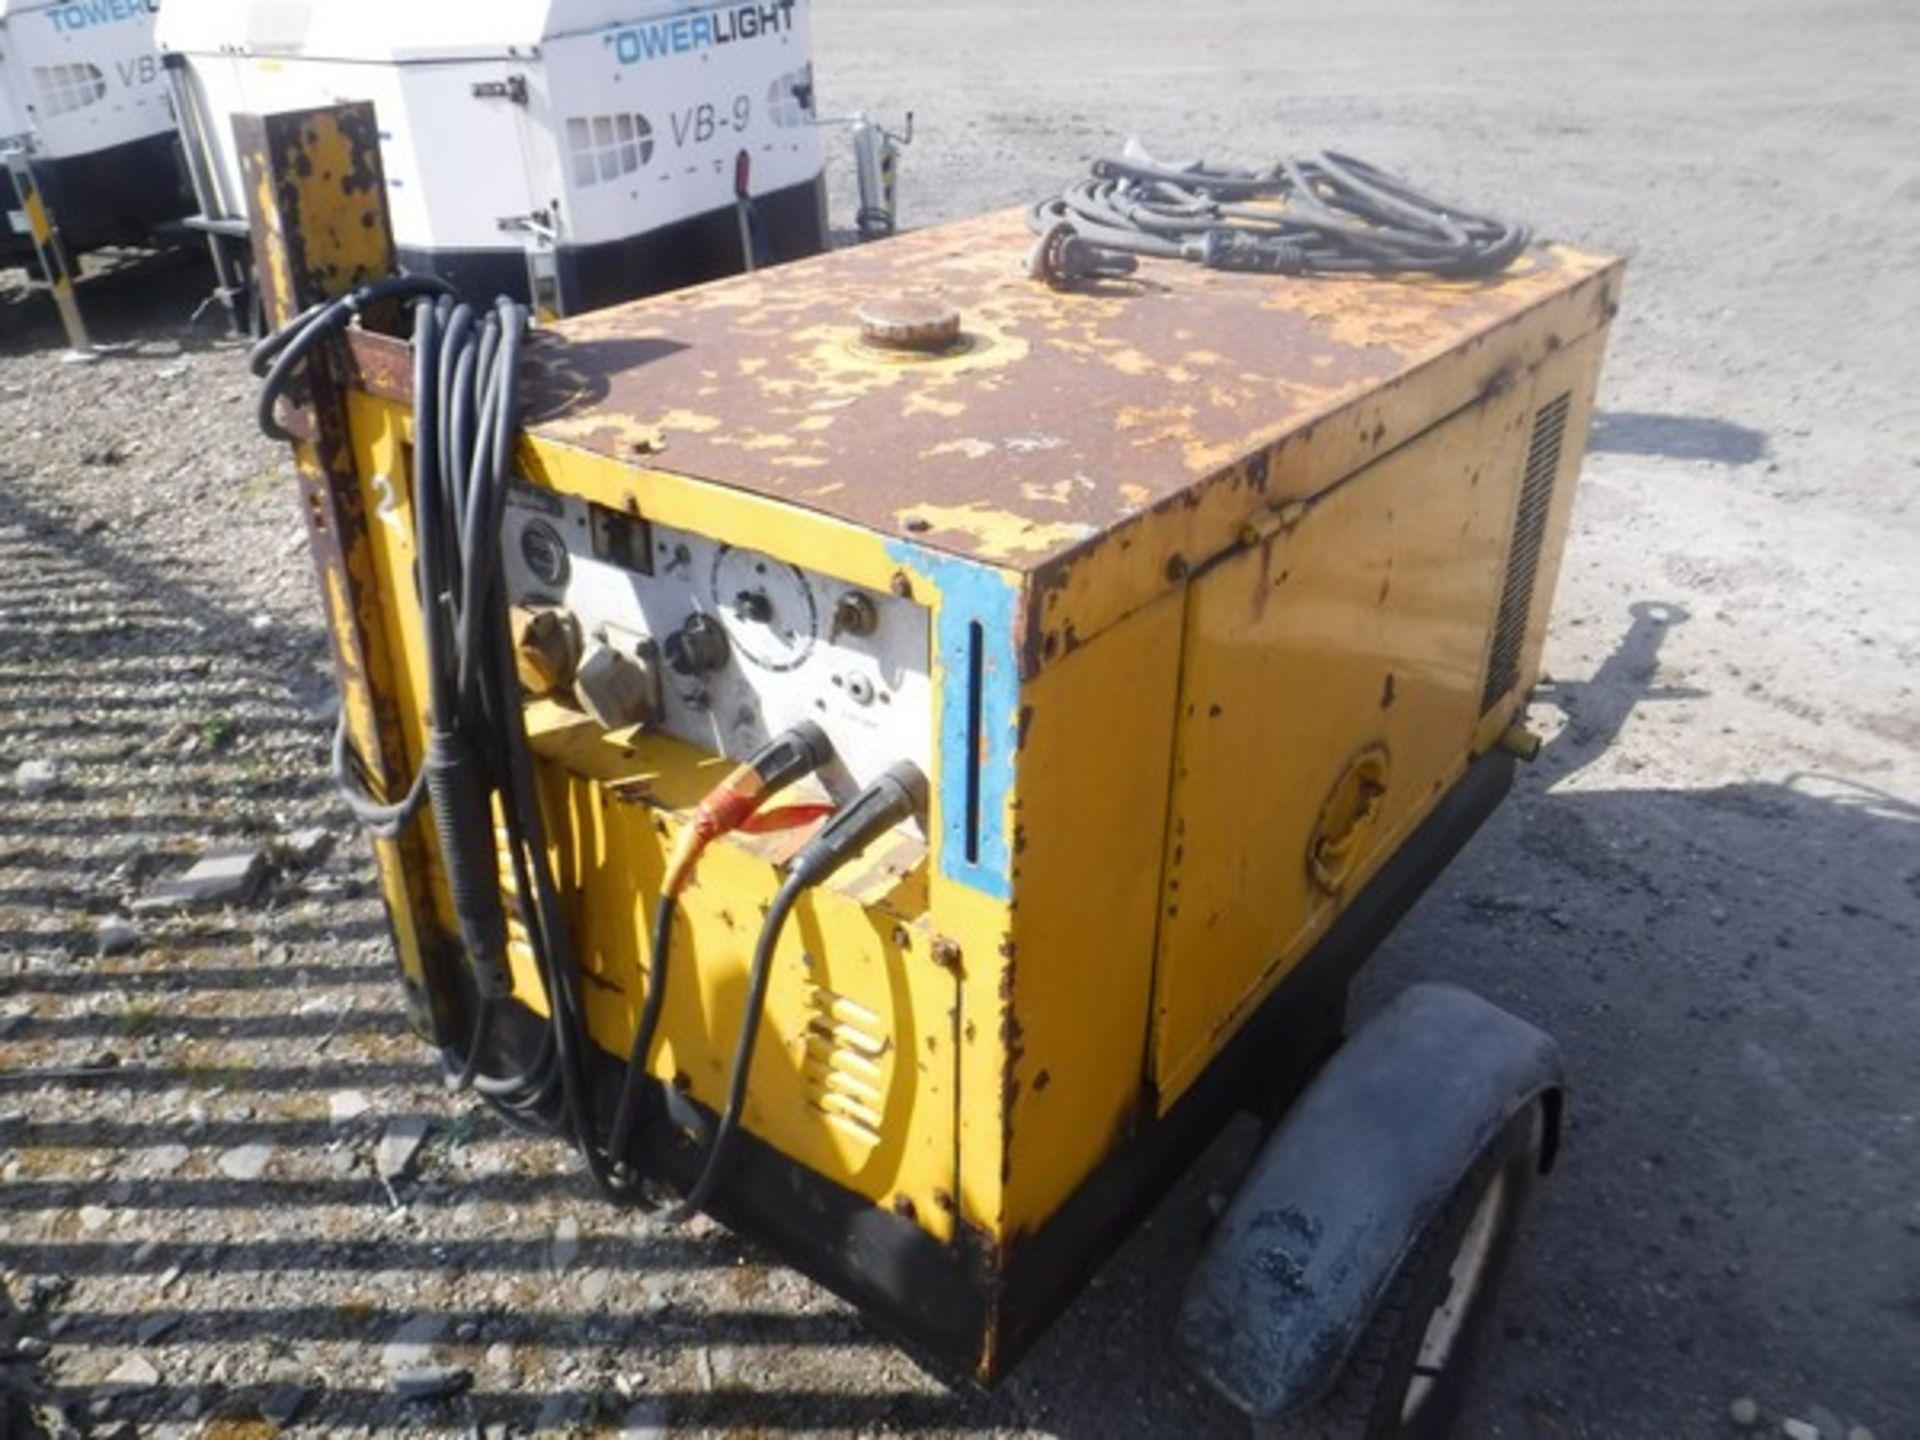 Auktionslos 370 - ARC GEN fast tow weldmaker/generator, 3 cylinder Kubota diesel engine 20-270amp 120/240V c